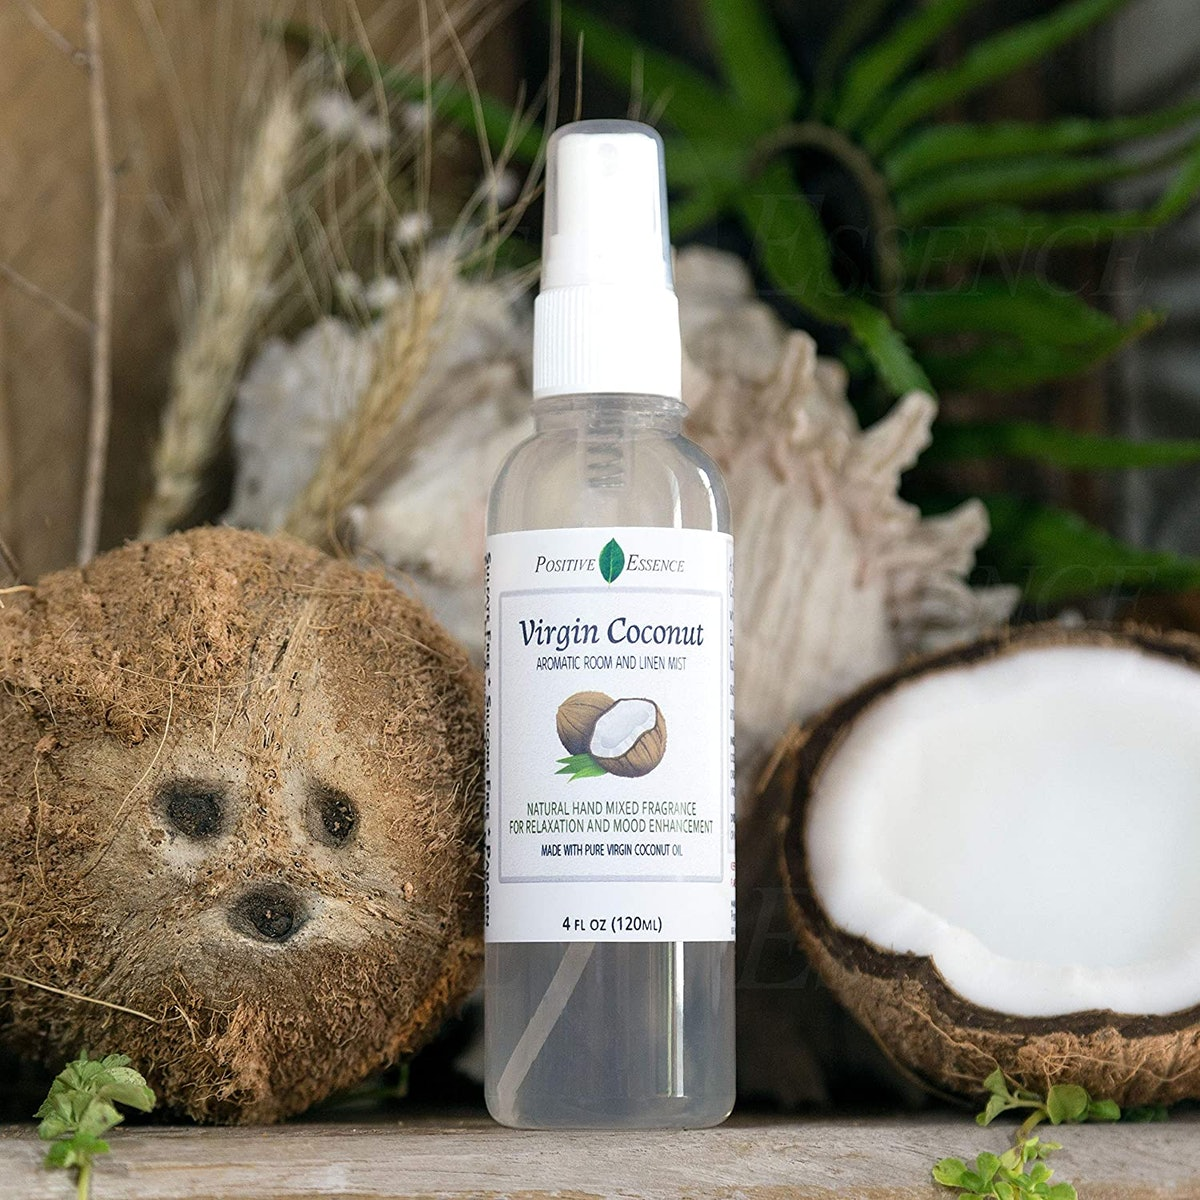 Positive Essence Positive Essence Virgin Coconut Linen and Room Spray